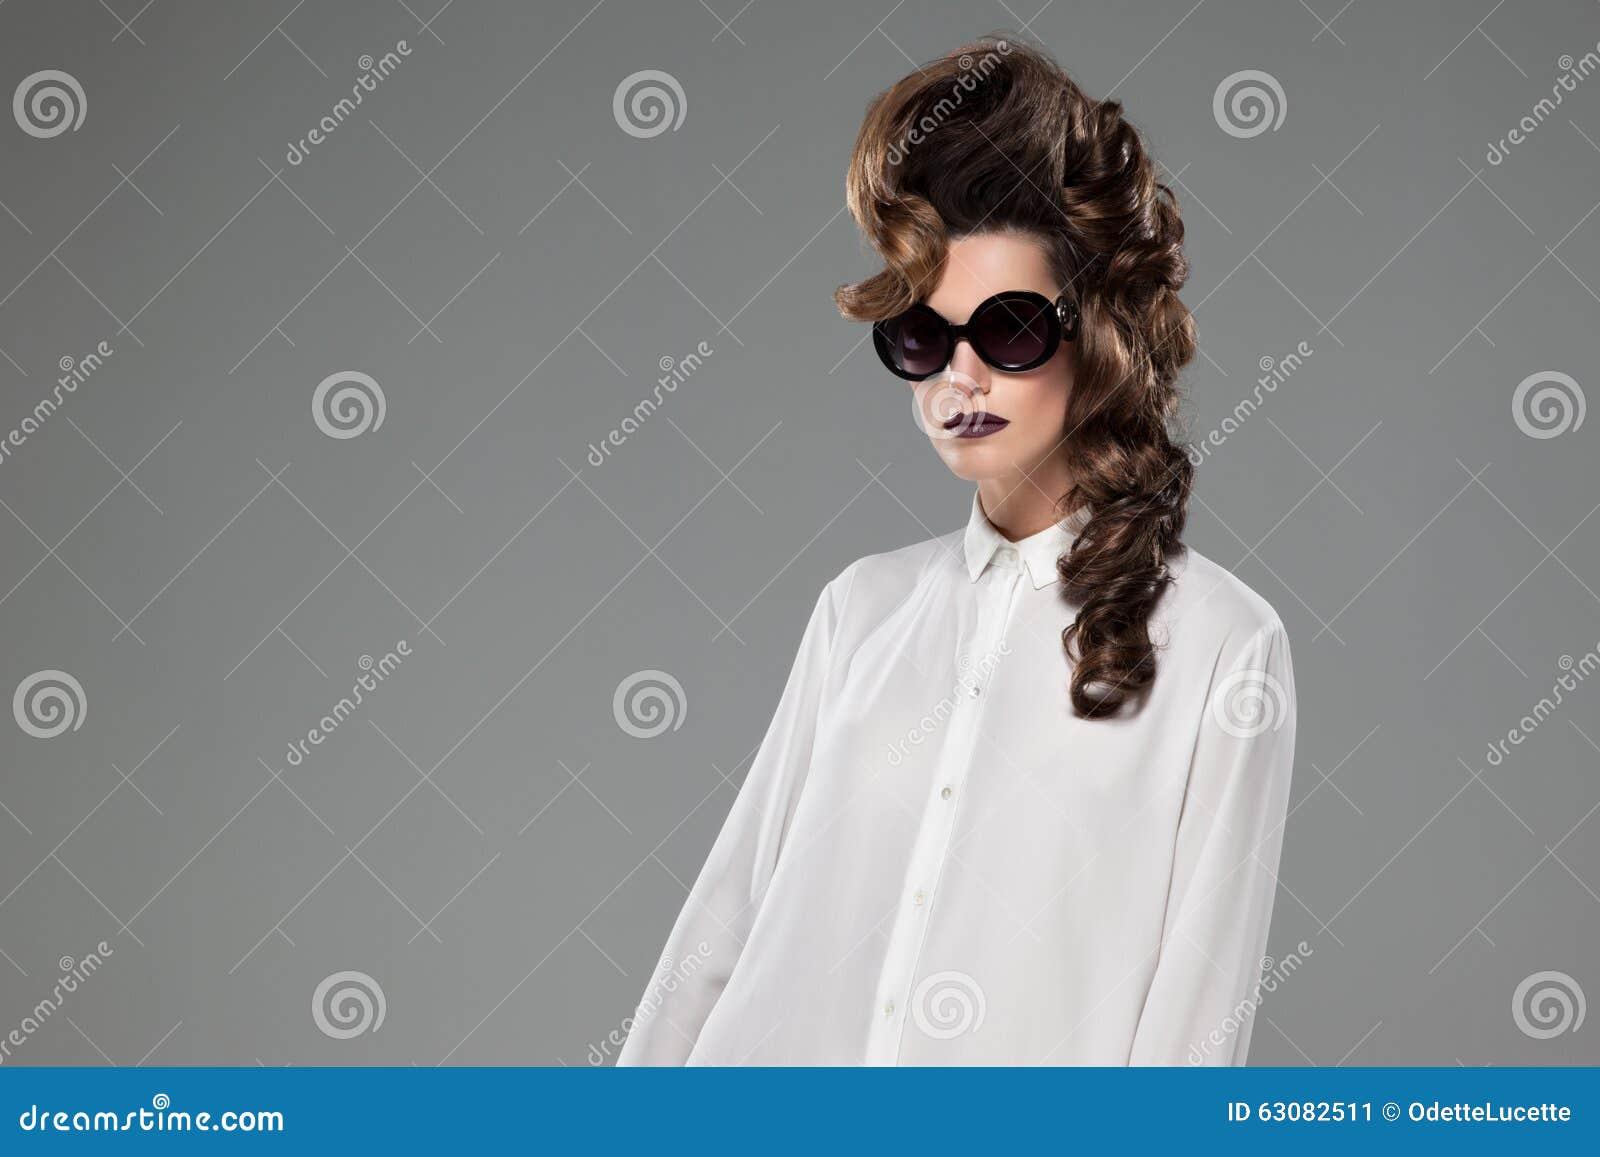 Download Femmes image stock. Image du gris, luxe, brun, blanc - 63082511